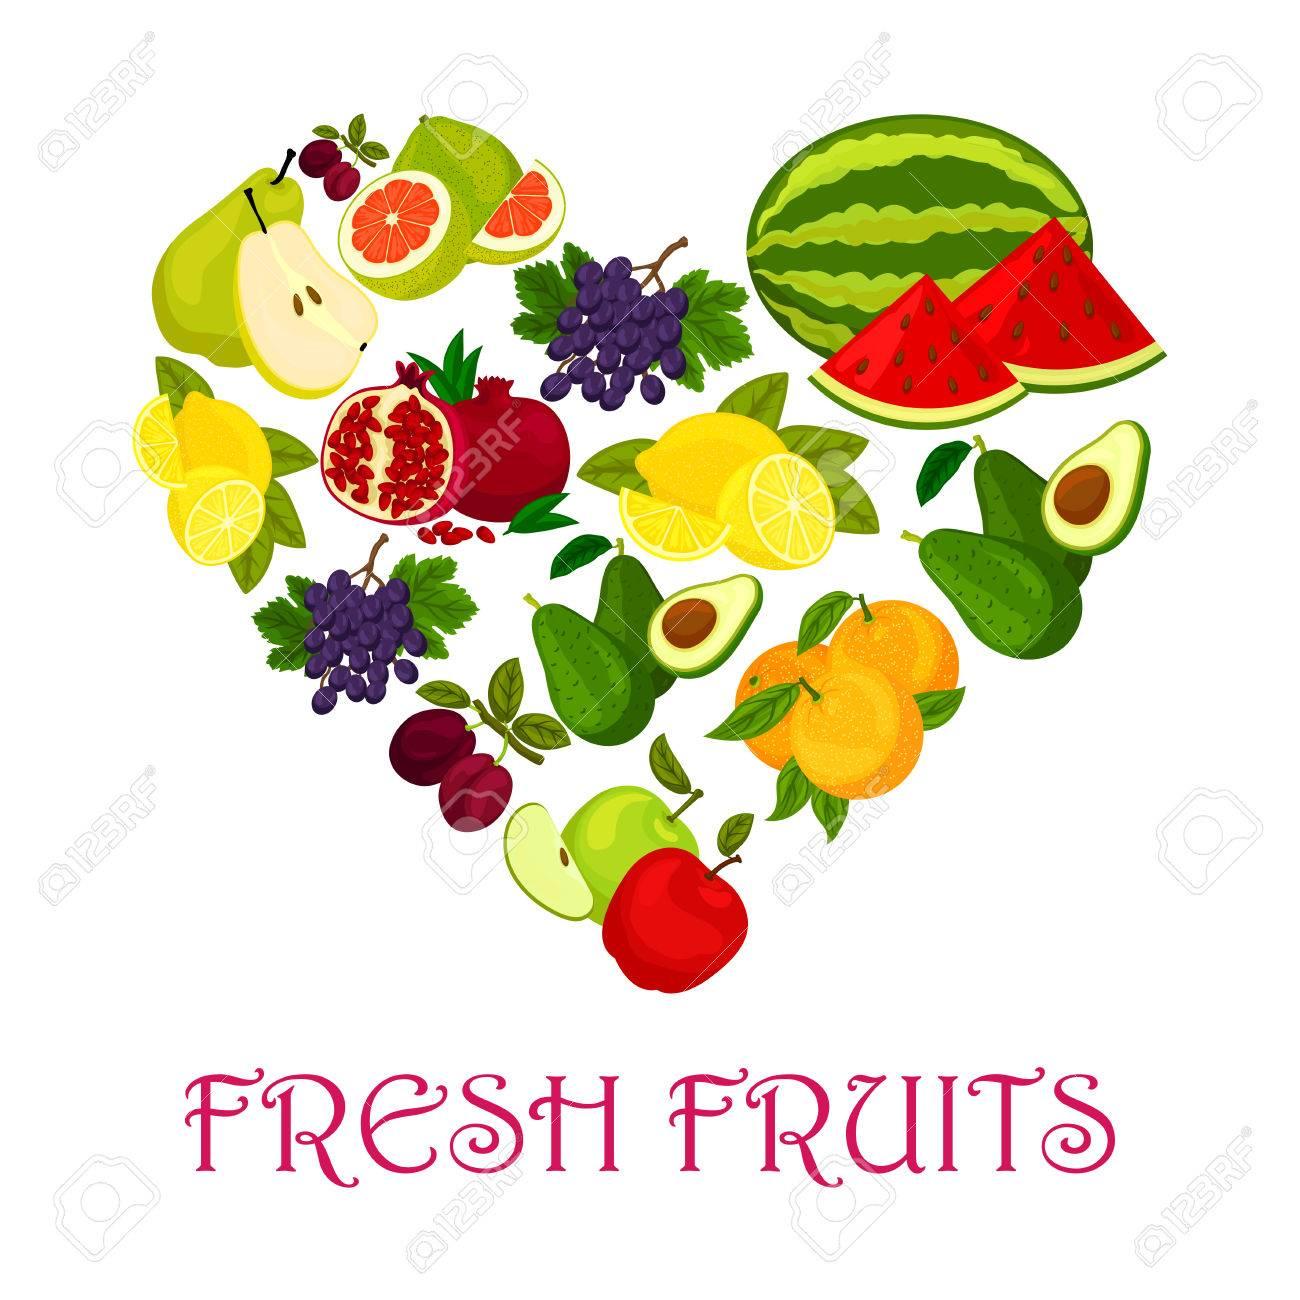 Fresh fruits heart symbol of watermelon orange and avocado fresh fruits heart symbol of watermelon orange and avocado pomegranate plum biocorpaavc